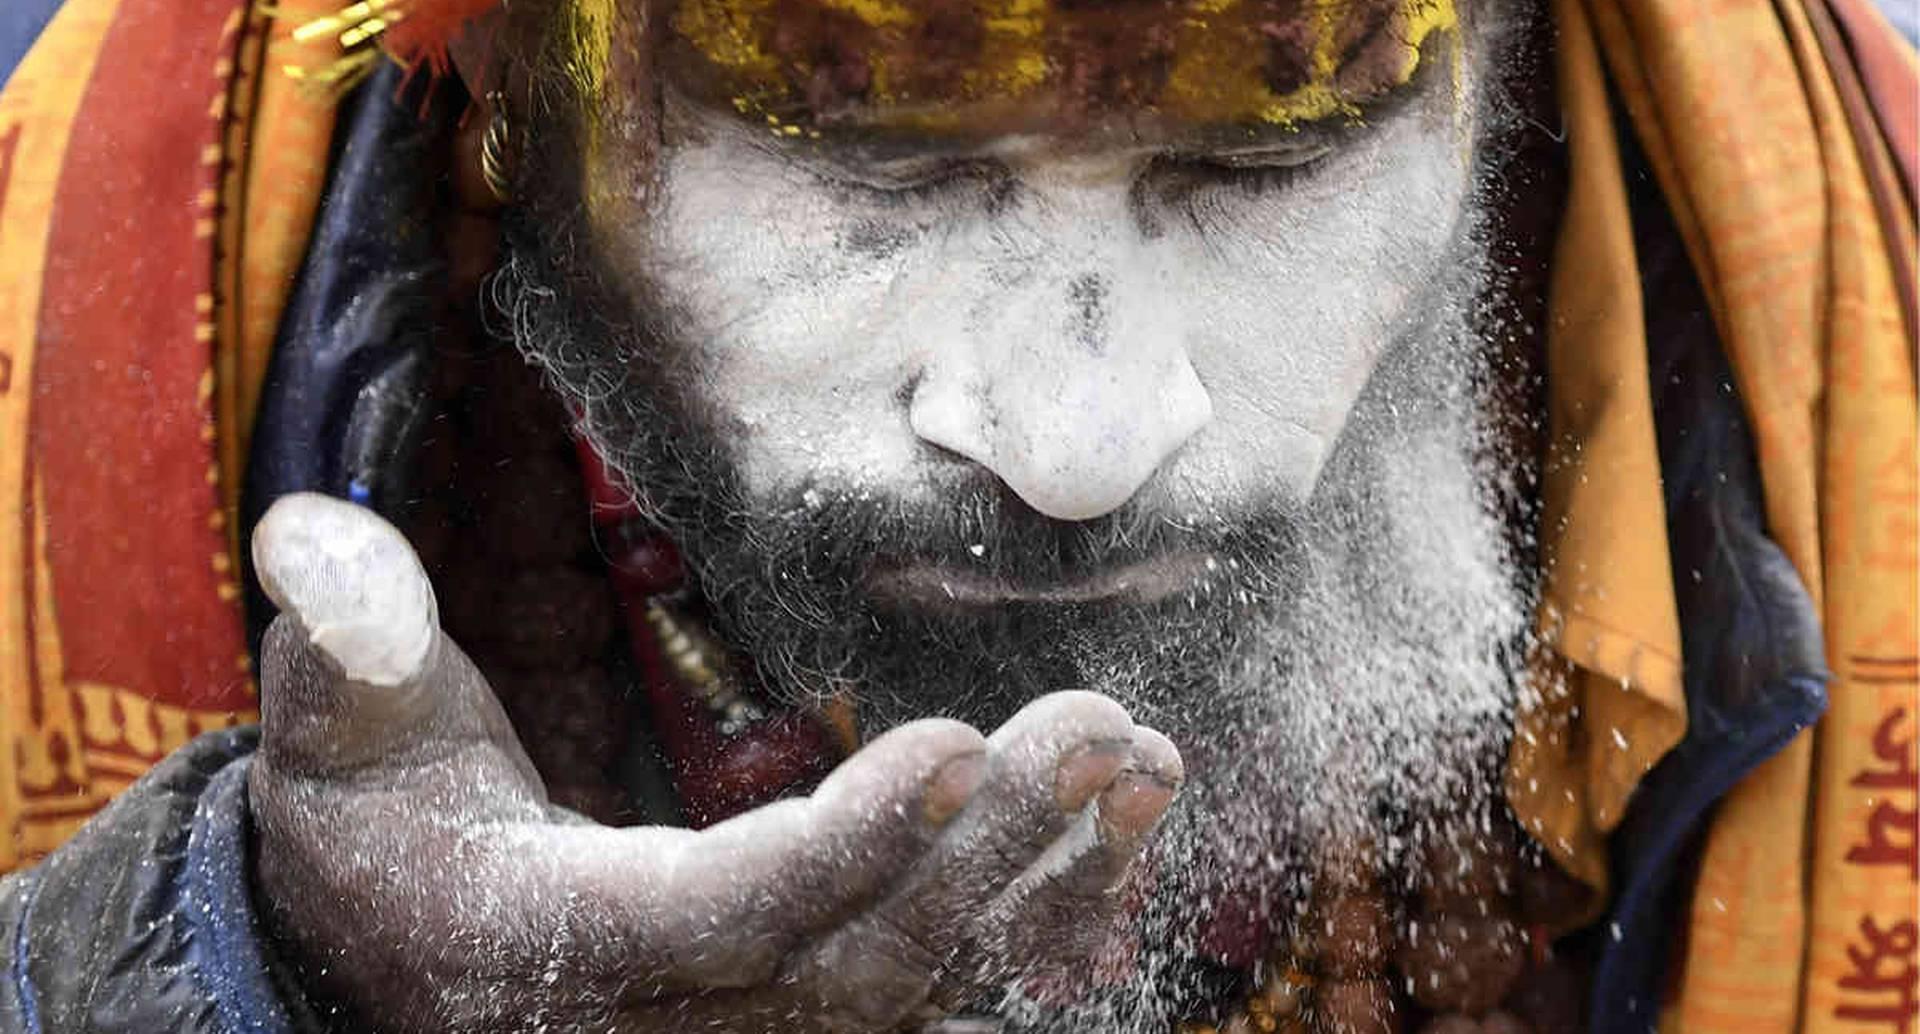 Un Sadhu (hombre santo hindú) mancha su rostro cerca del templo Pashupatinath en la víspera de el festival hindú de Maha Shivaratri, en el Templo Pashupatinath, en Katmandú, el 20 de febrero de 2020. El Maha Shivaratri es un festival hindú celebrado antes de la llegada de primavera. Foto: Prakash Mathema/ AFP.